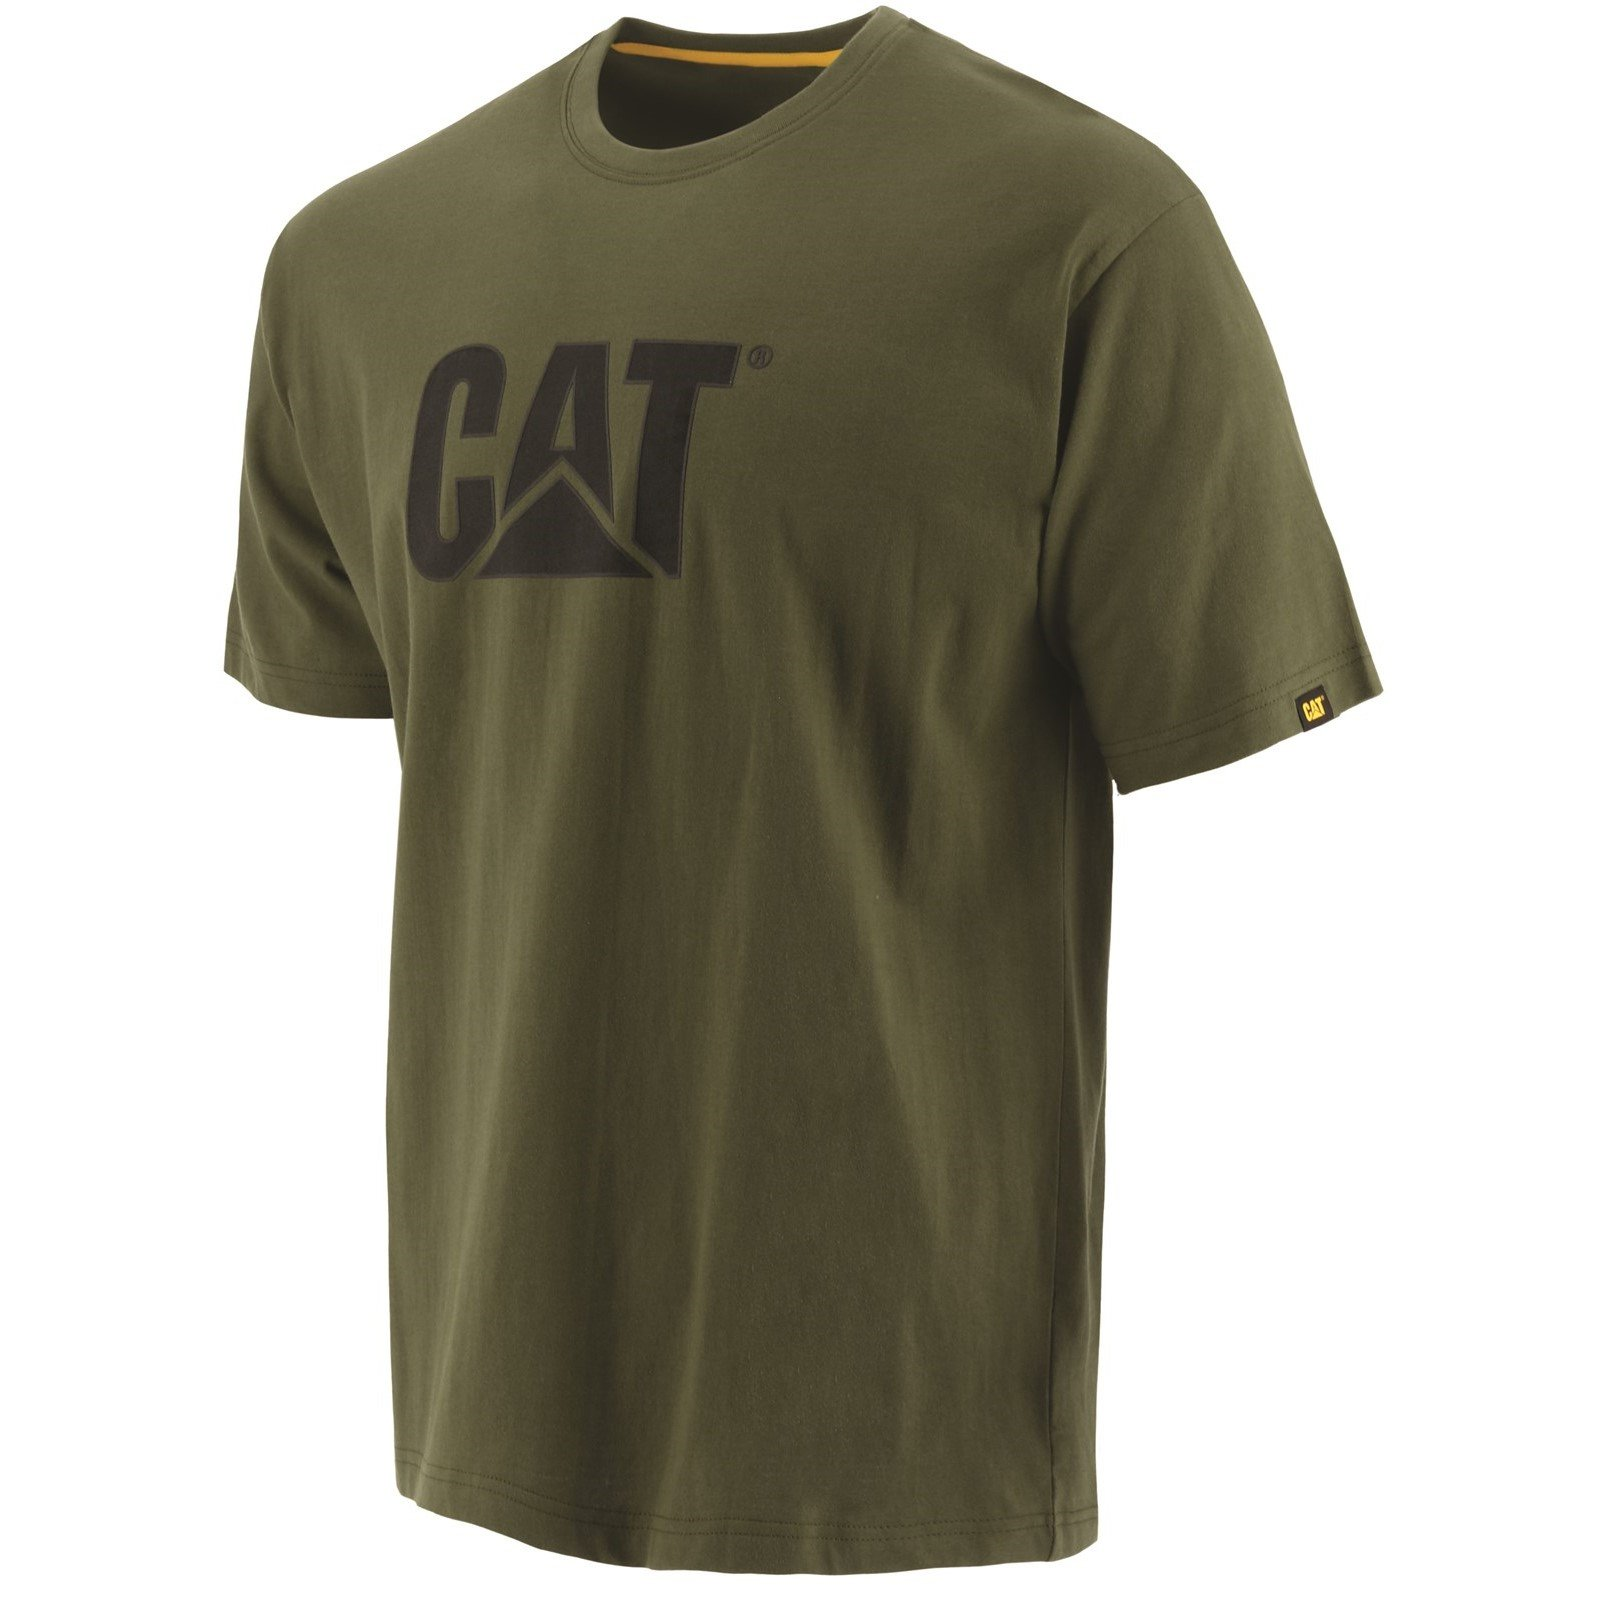 Caterpillar Men's Trademark Logo T-Shirt Various Colours 25301-42086 - Chive X